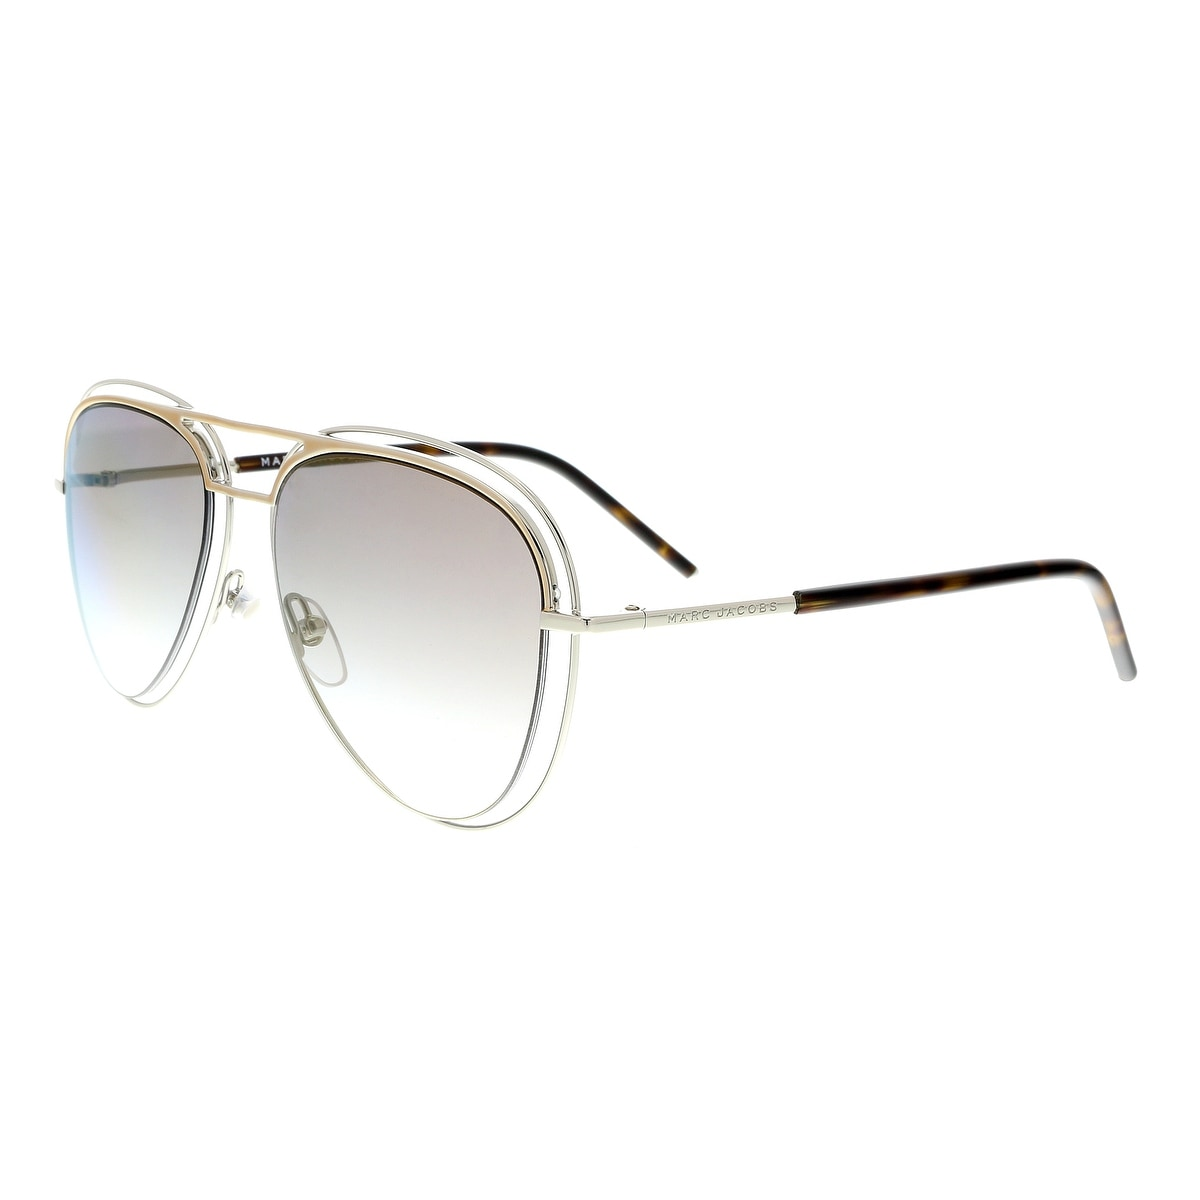 38af277c7822 Sunglasses | Shop our Best Clothing & Shoes Deals Online at Overstock